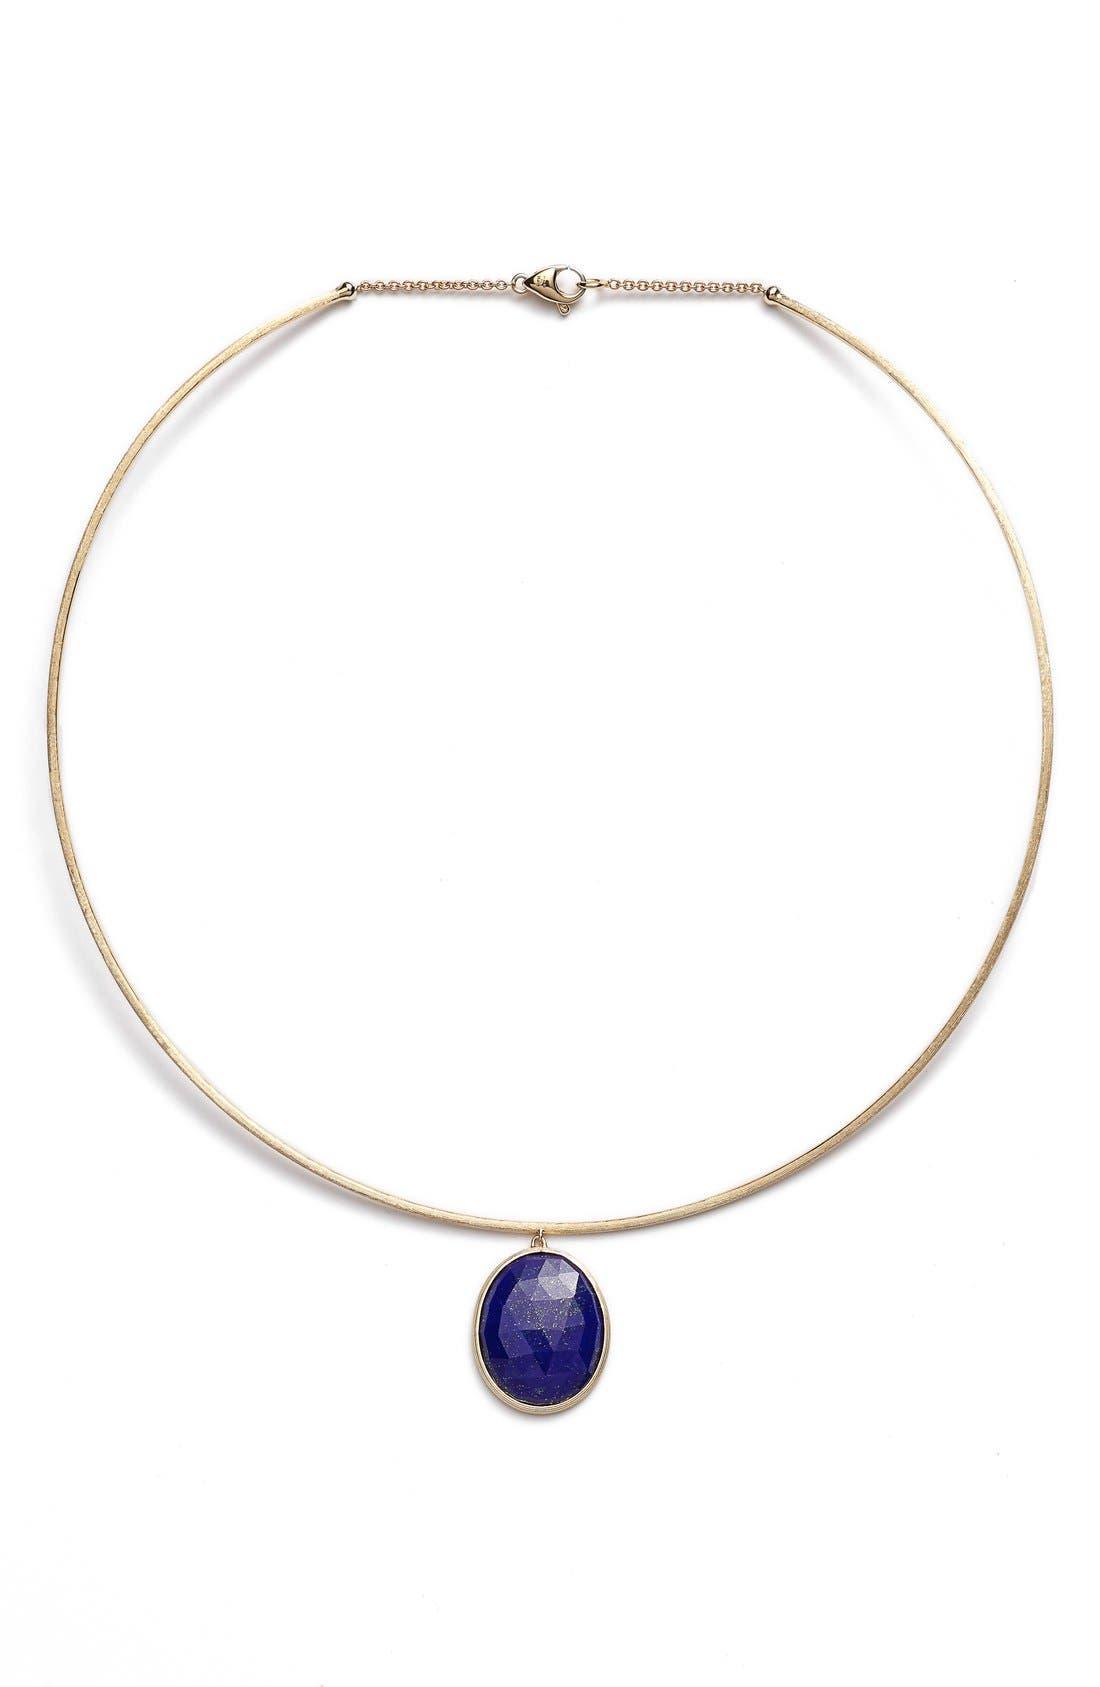 Main Image - Marco Bicego 'Lunaria' Lapis Collar Necklace